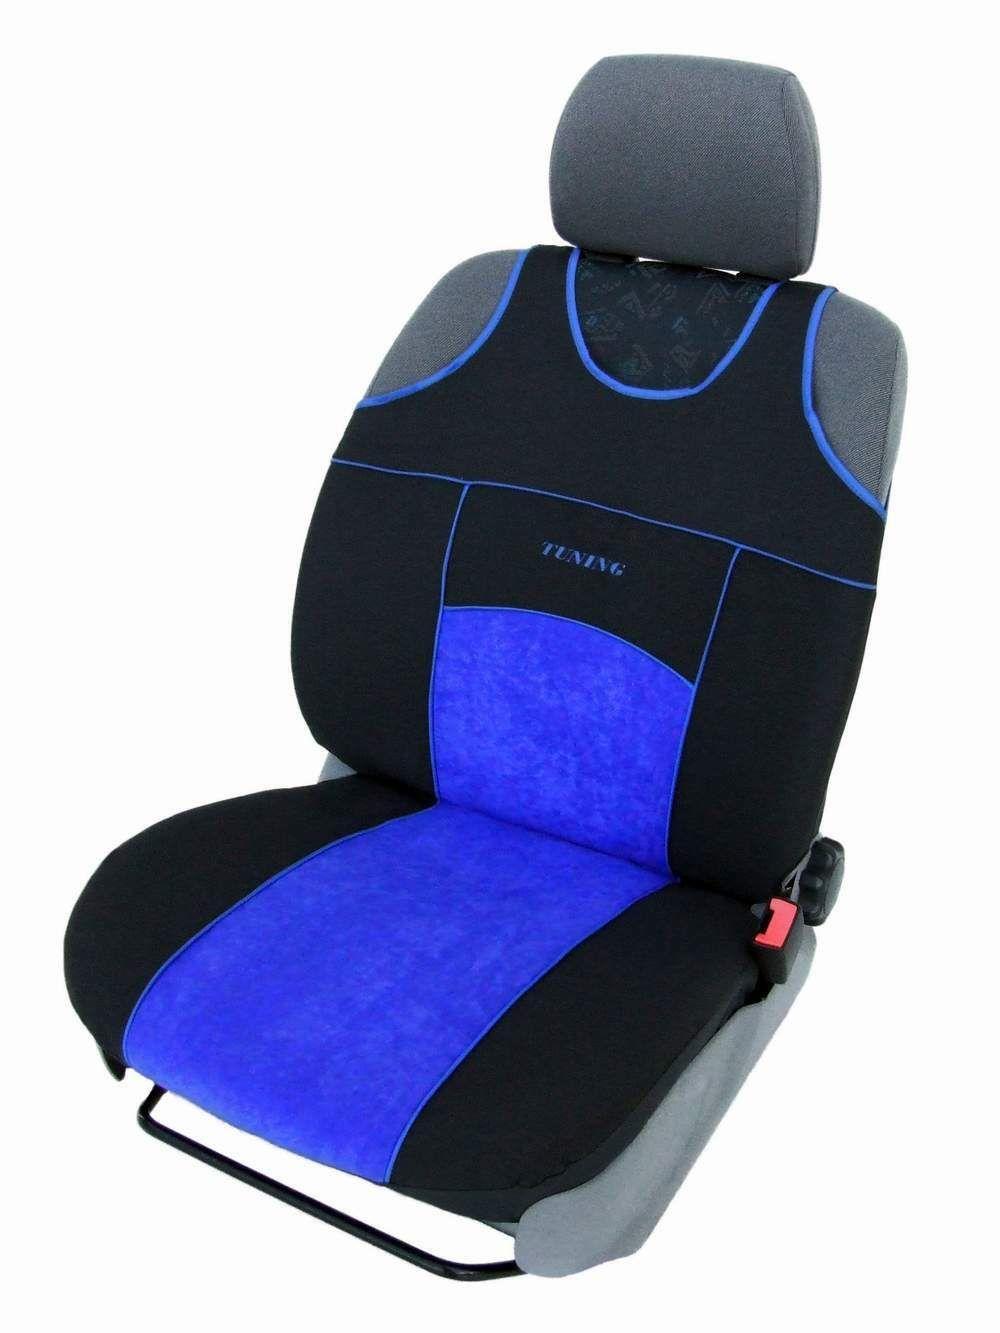 Autopotahy TUNING EXTREME s alcantarou, sada pro dvě sedadla, modré